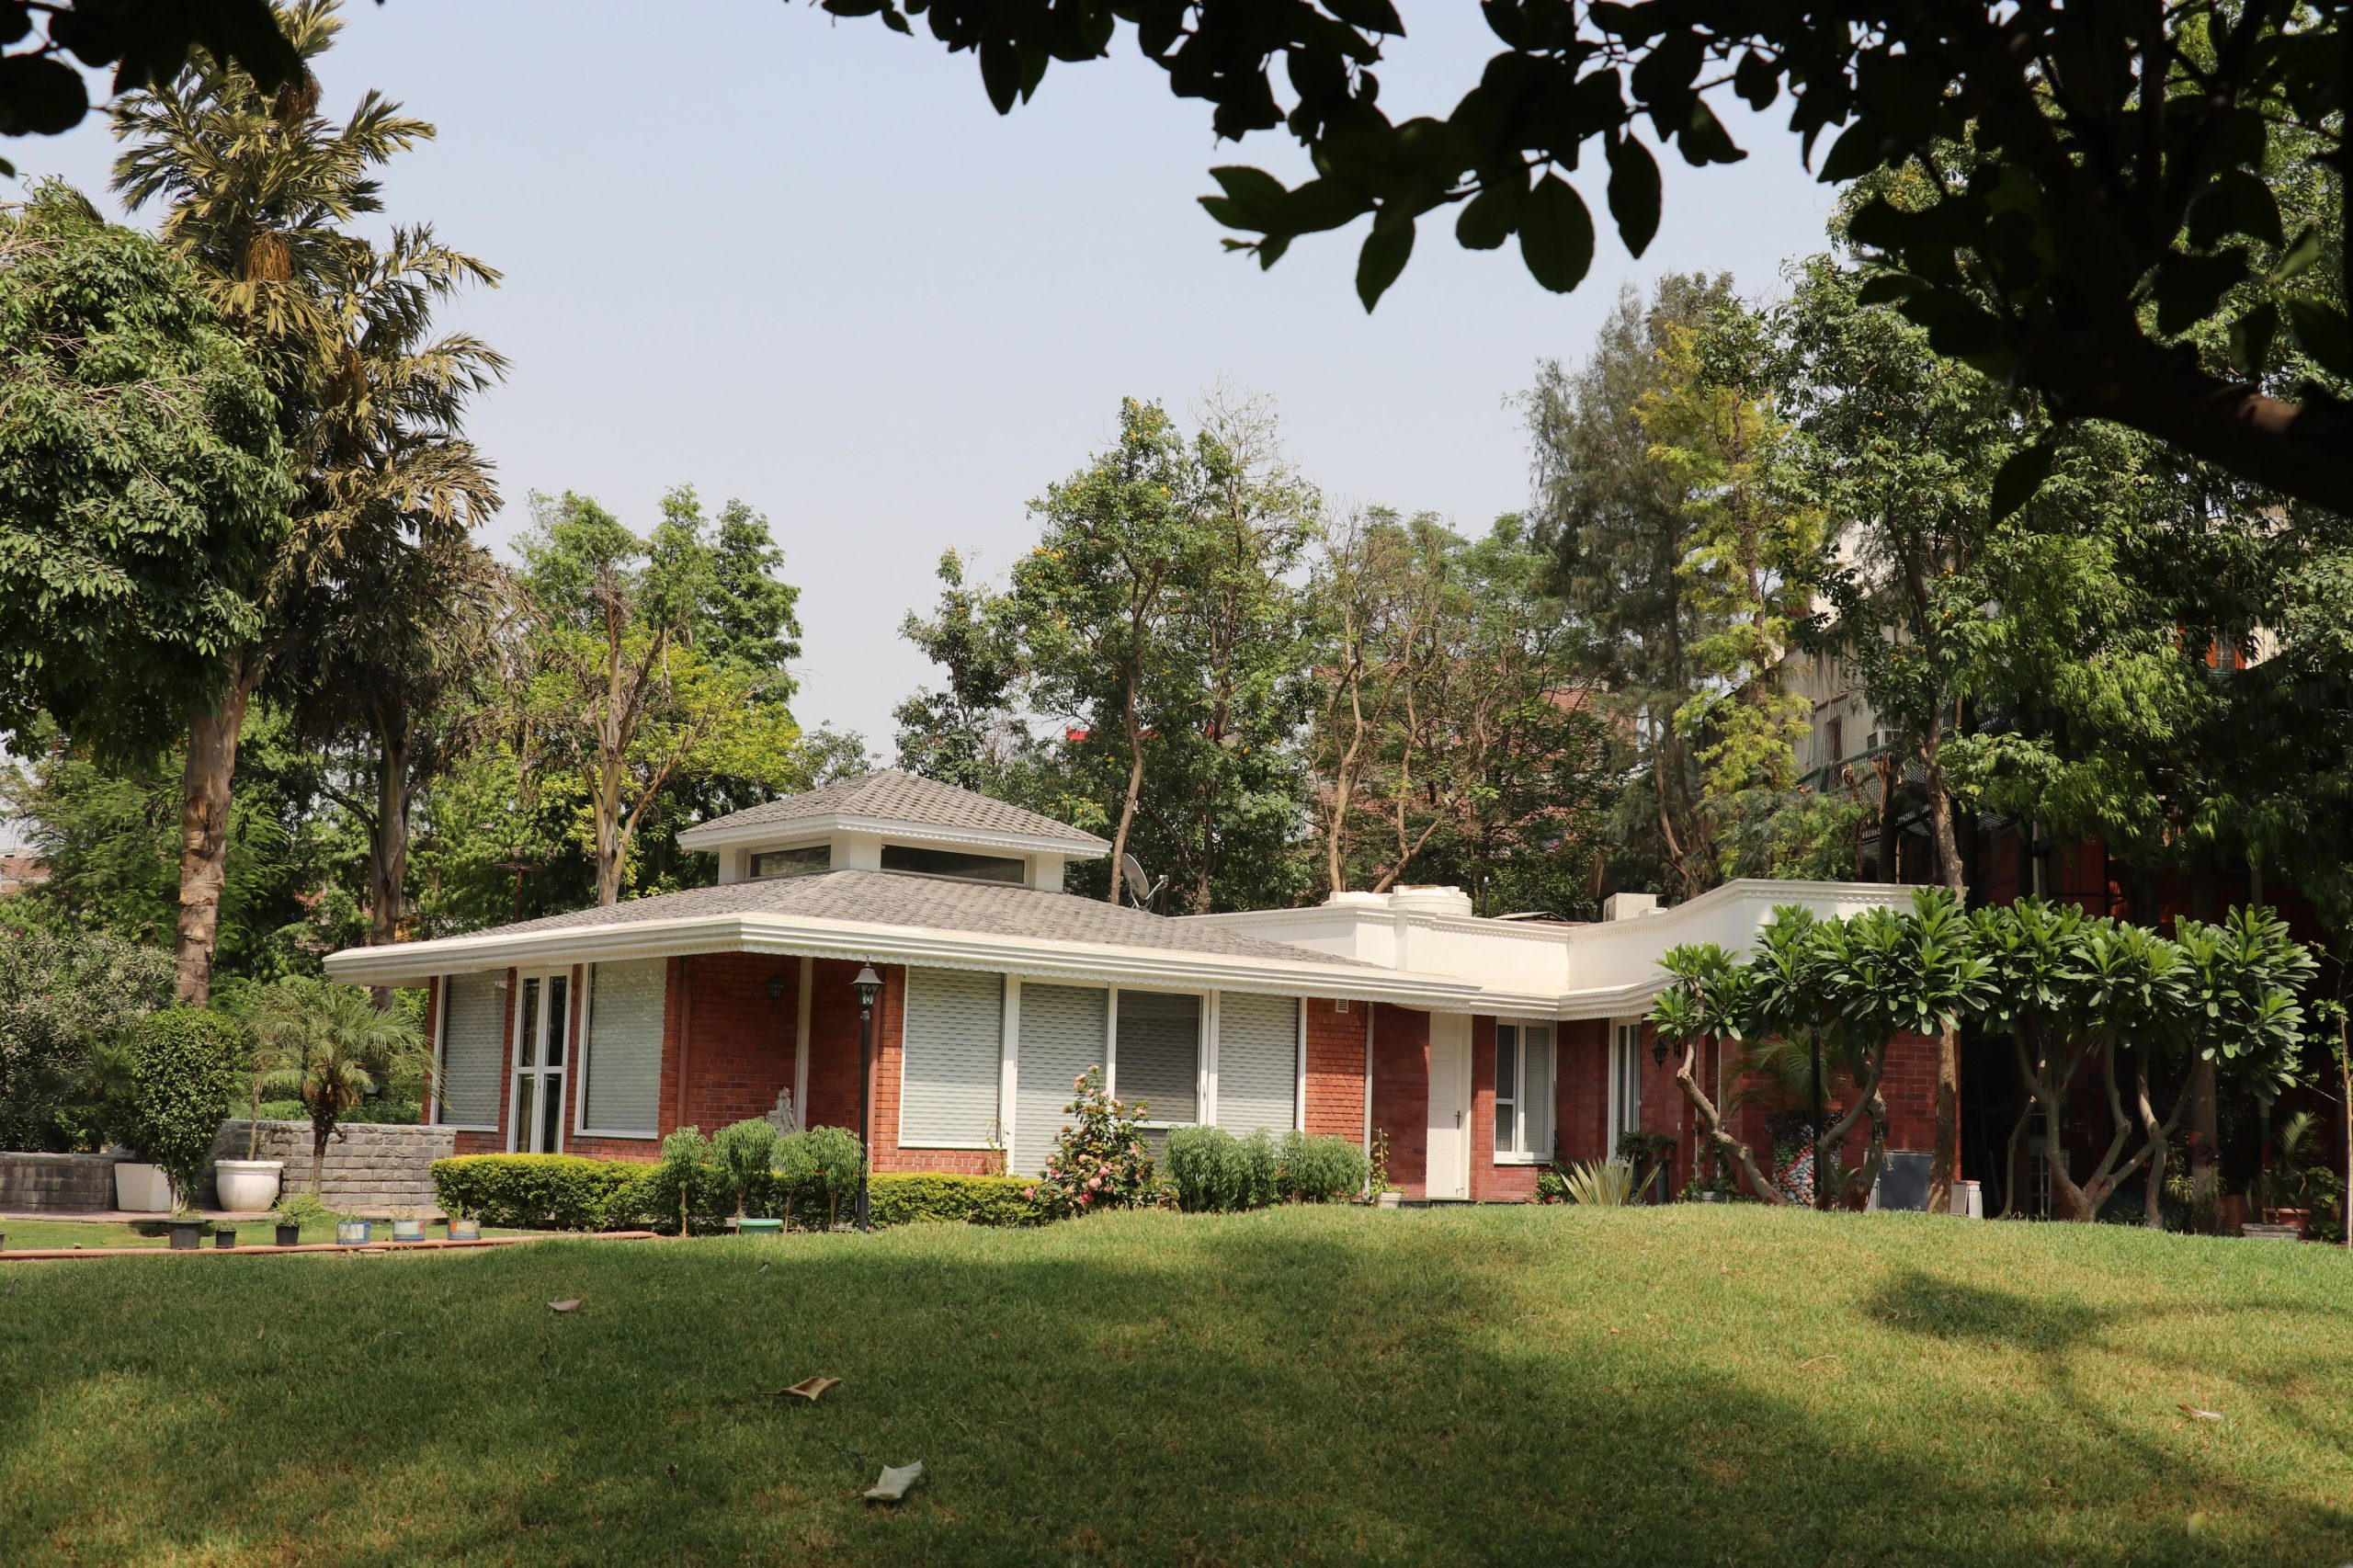 A house around greenery